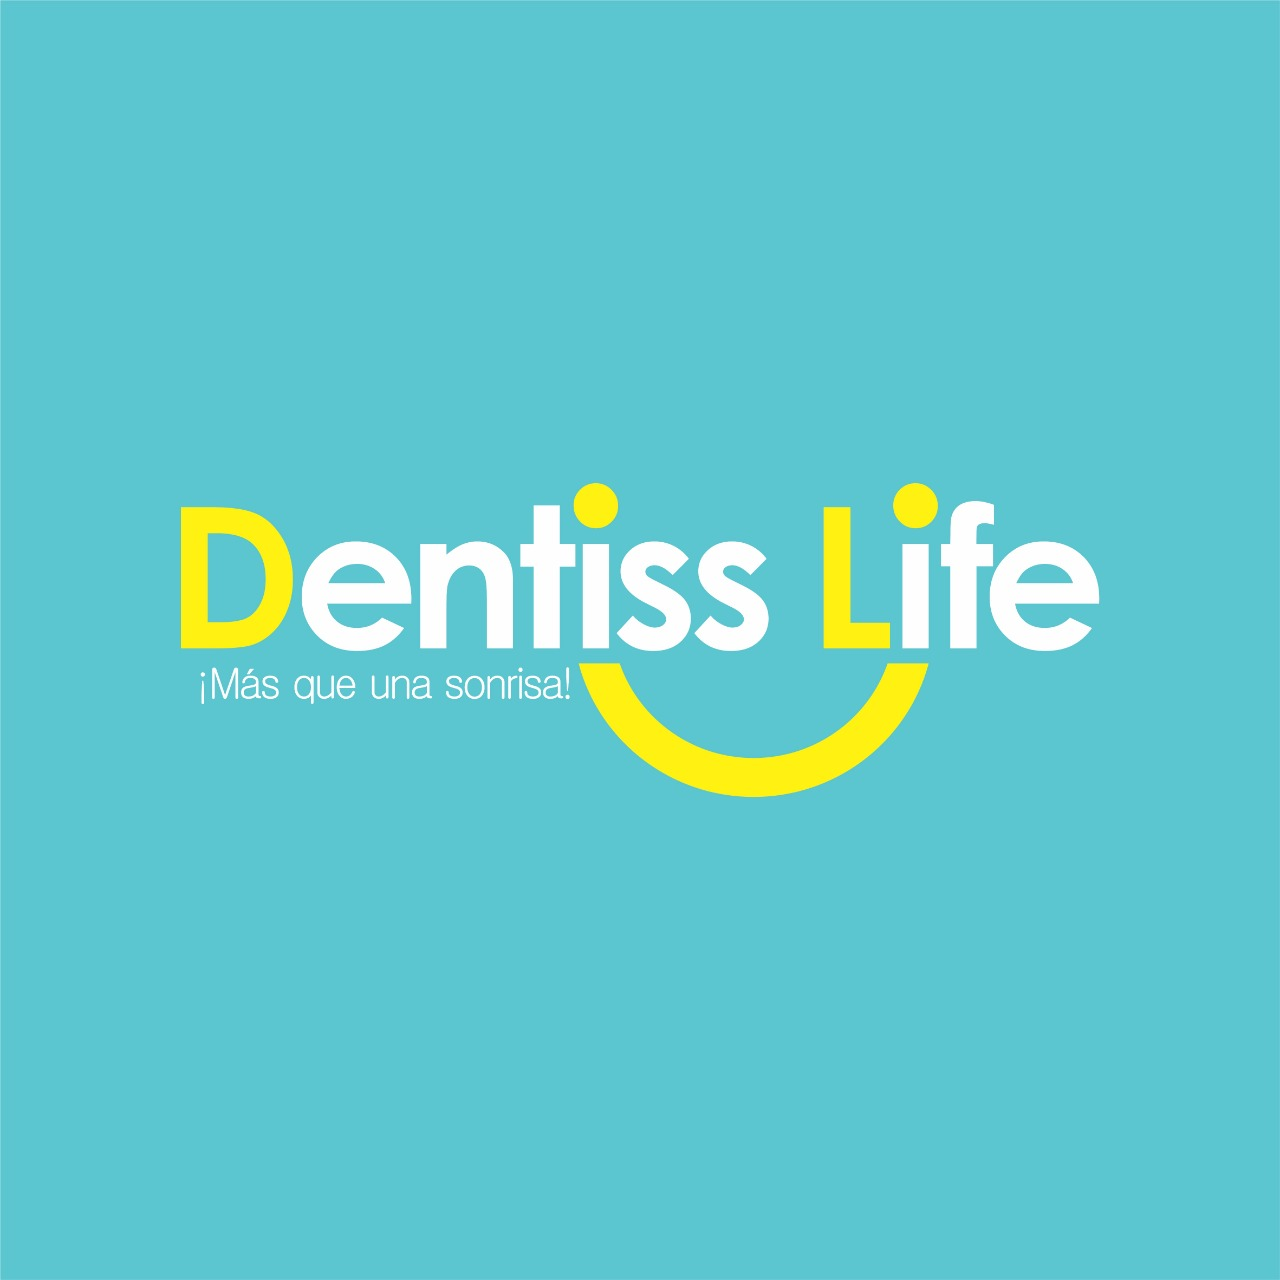 DENTISS LIFE